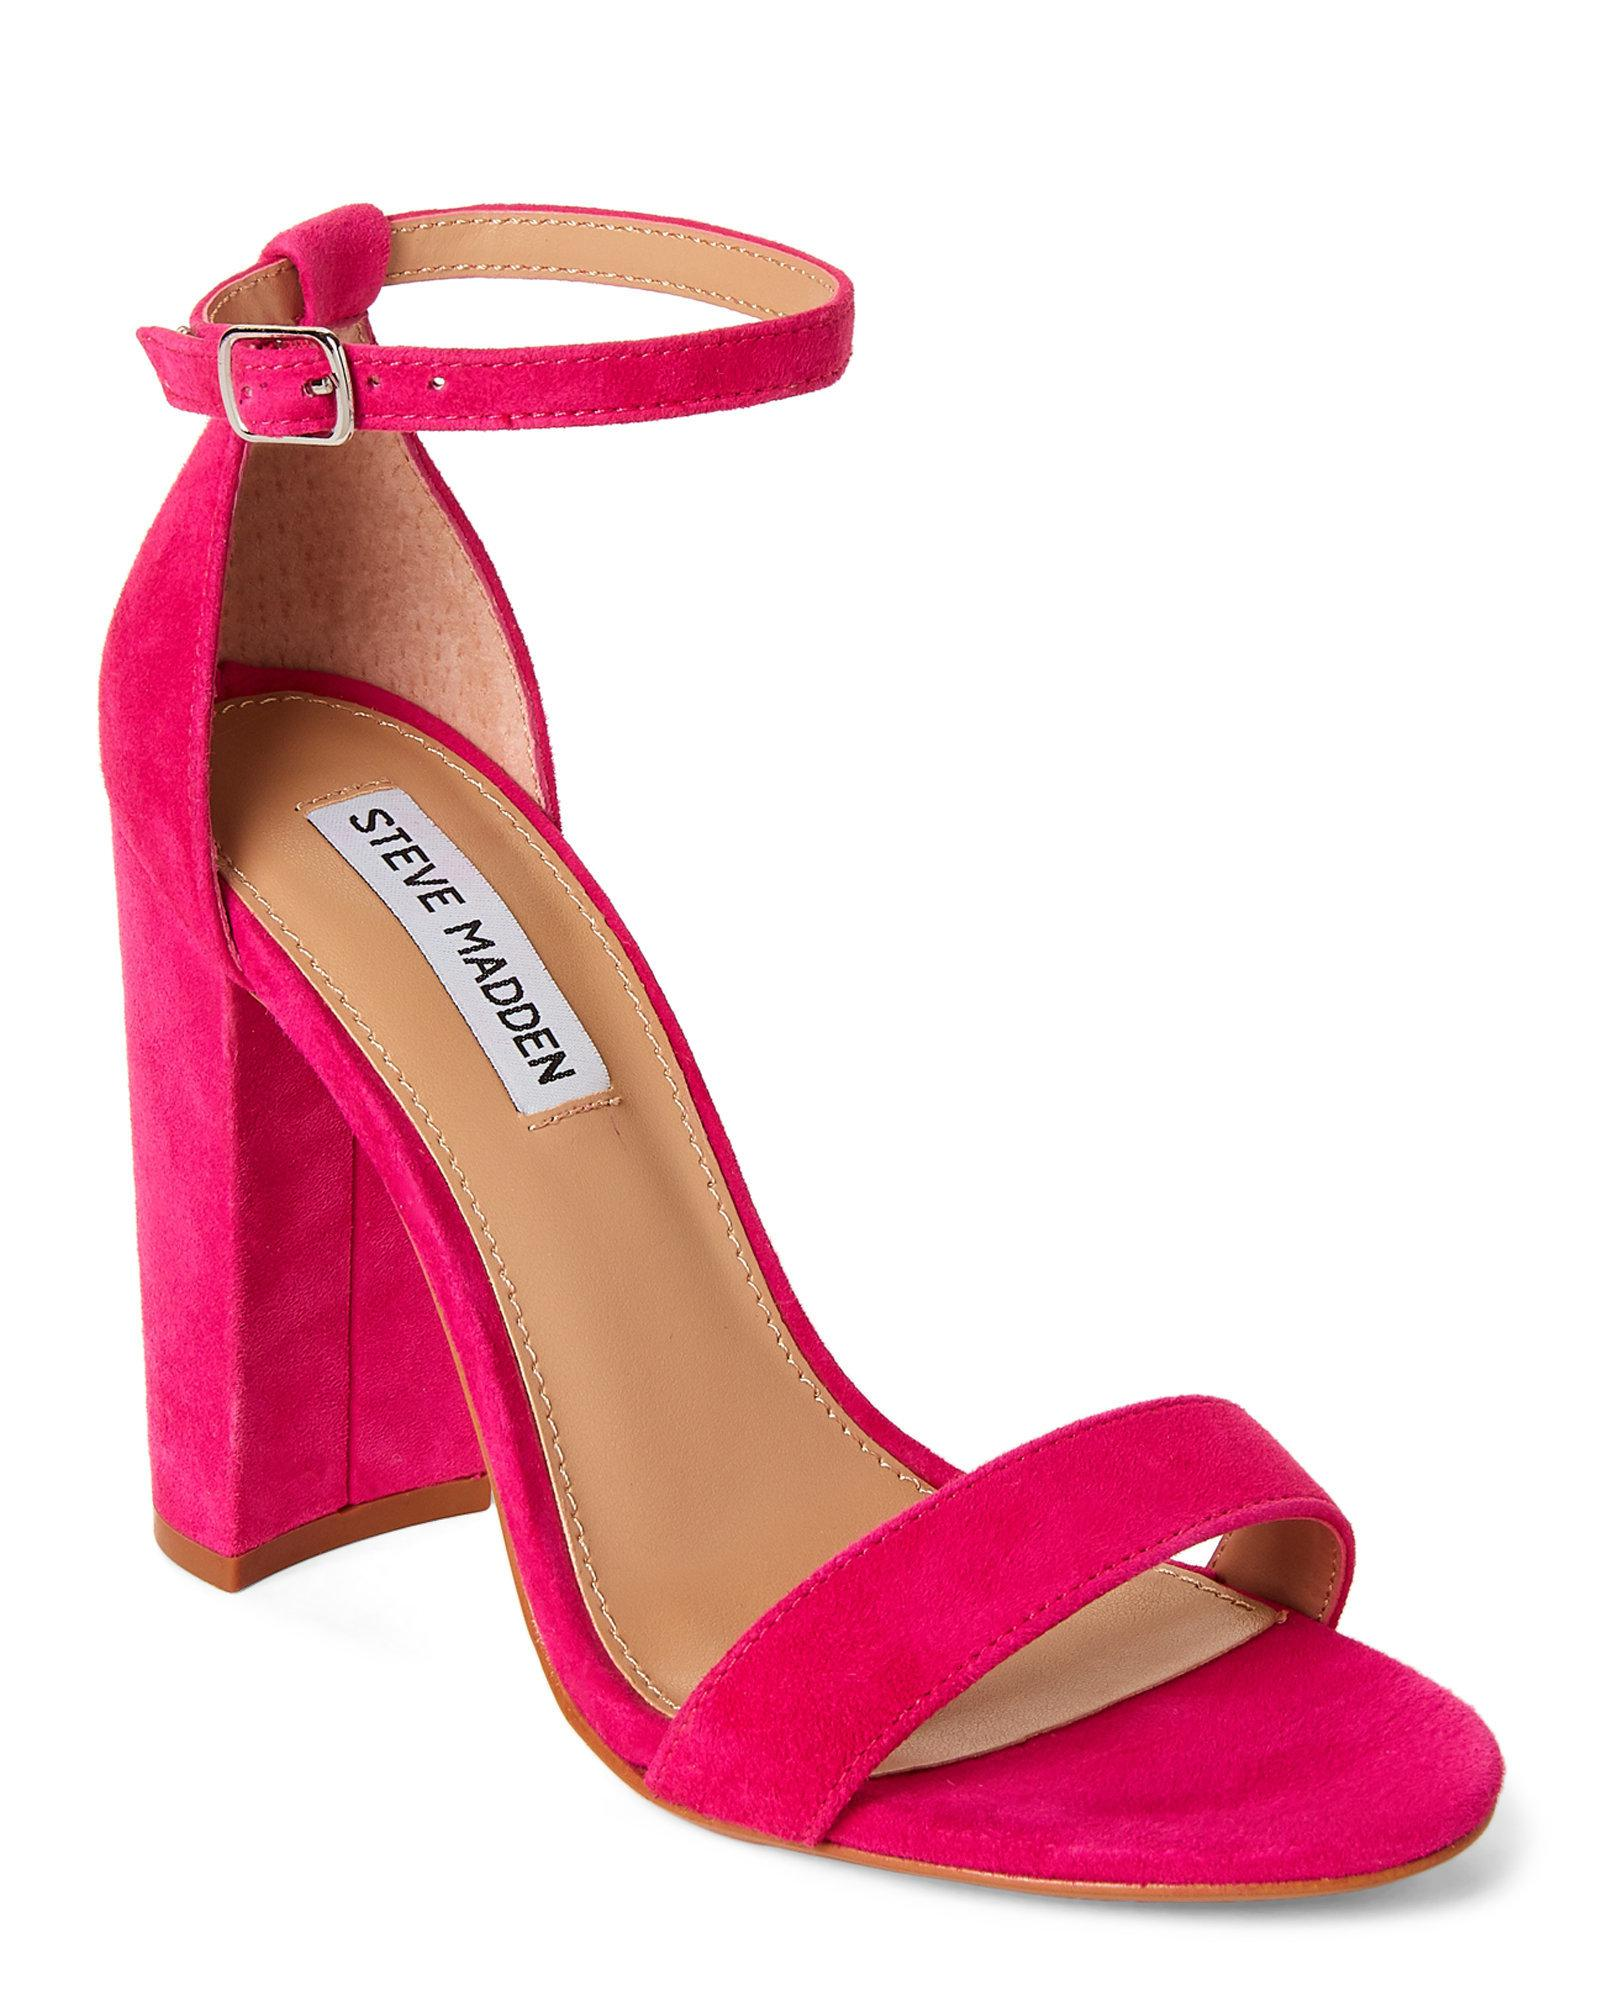 66e51d4c057 Steve Madden Hot Pink Carrson Ankle Strap Suede Sandals